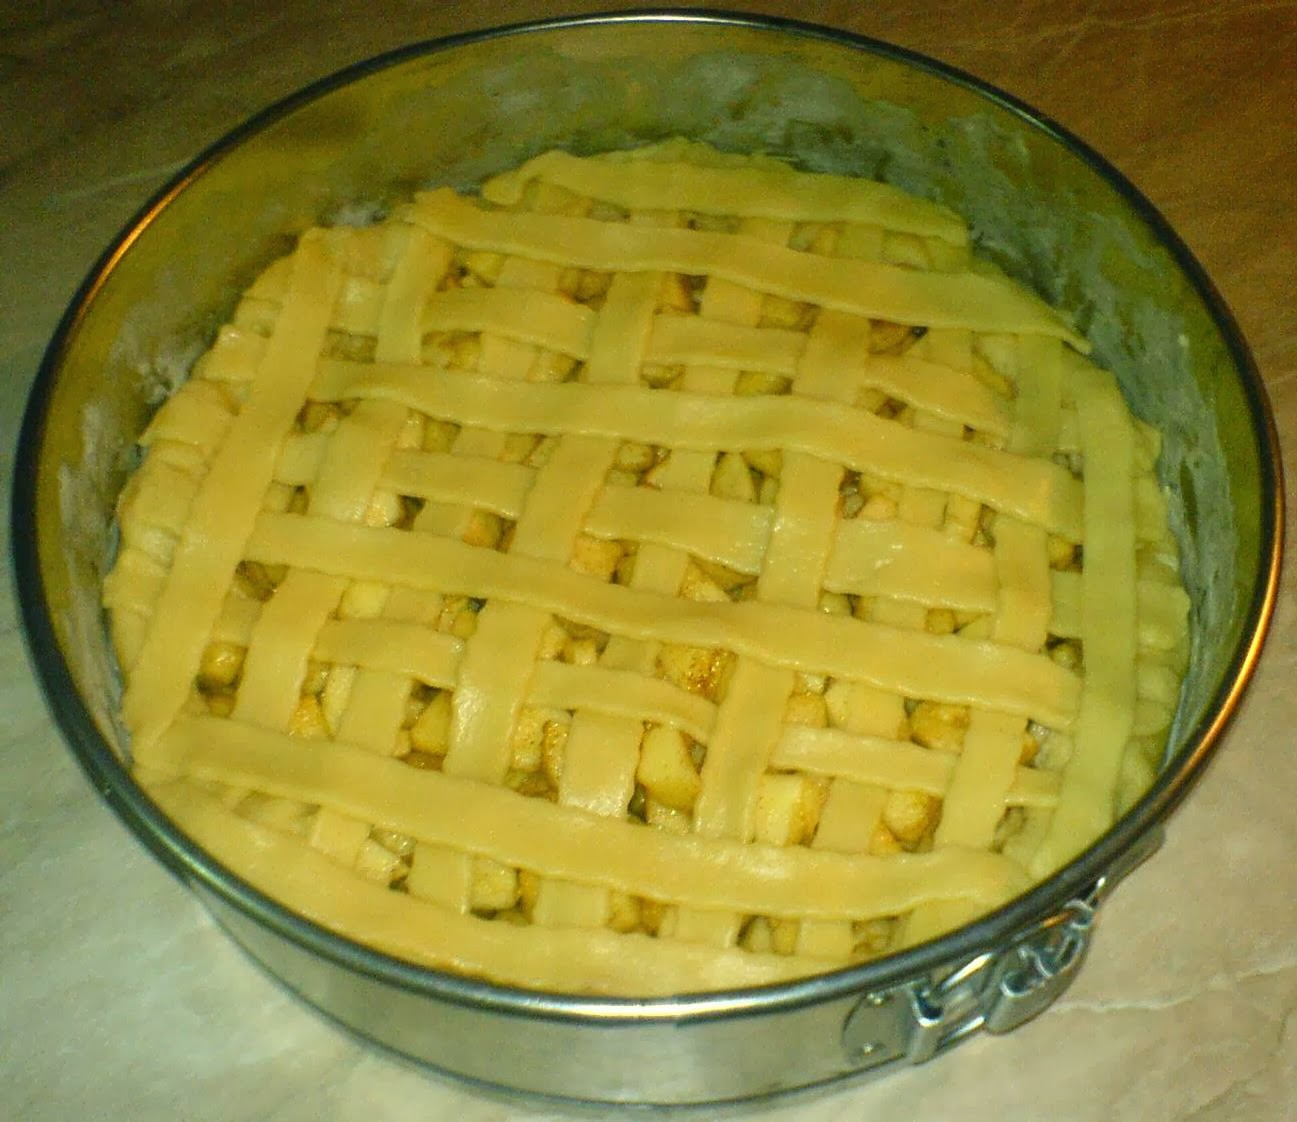 placinta cu mere, placinta de mere, dulciuri, prajituri, torturi, mod preparare, retete culinare cu fructe,